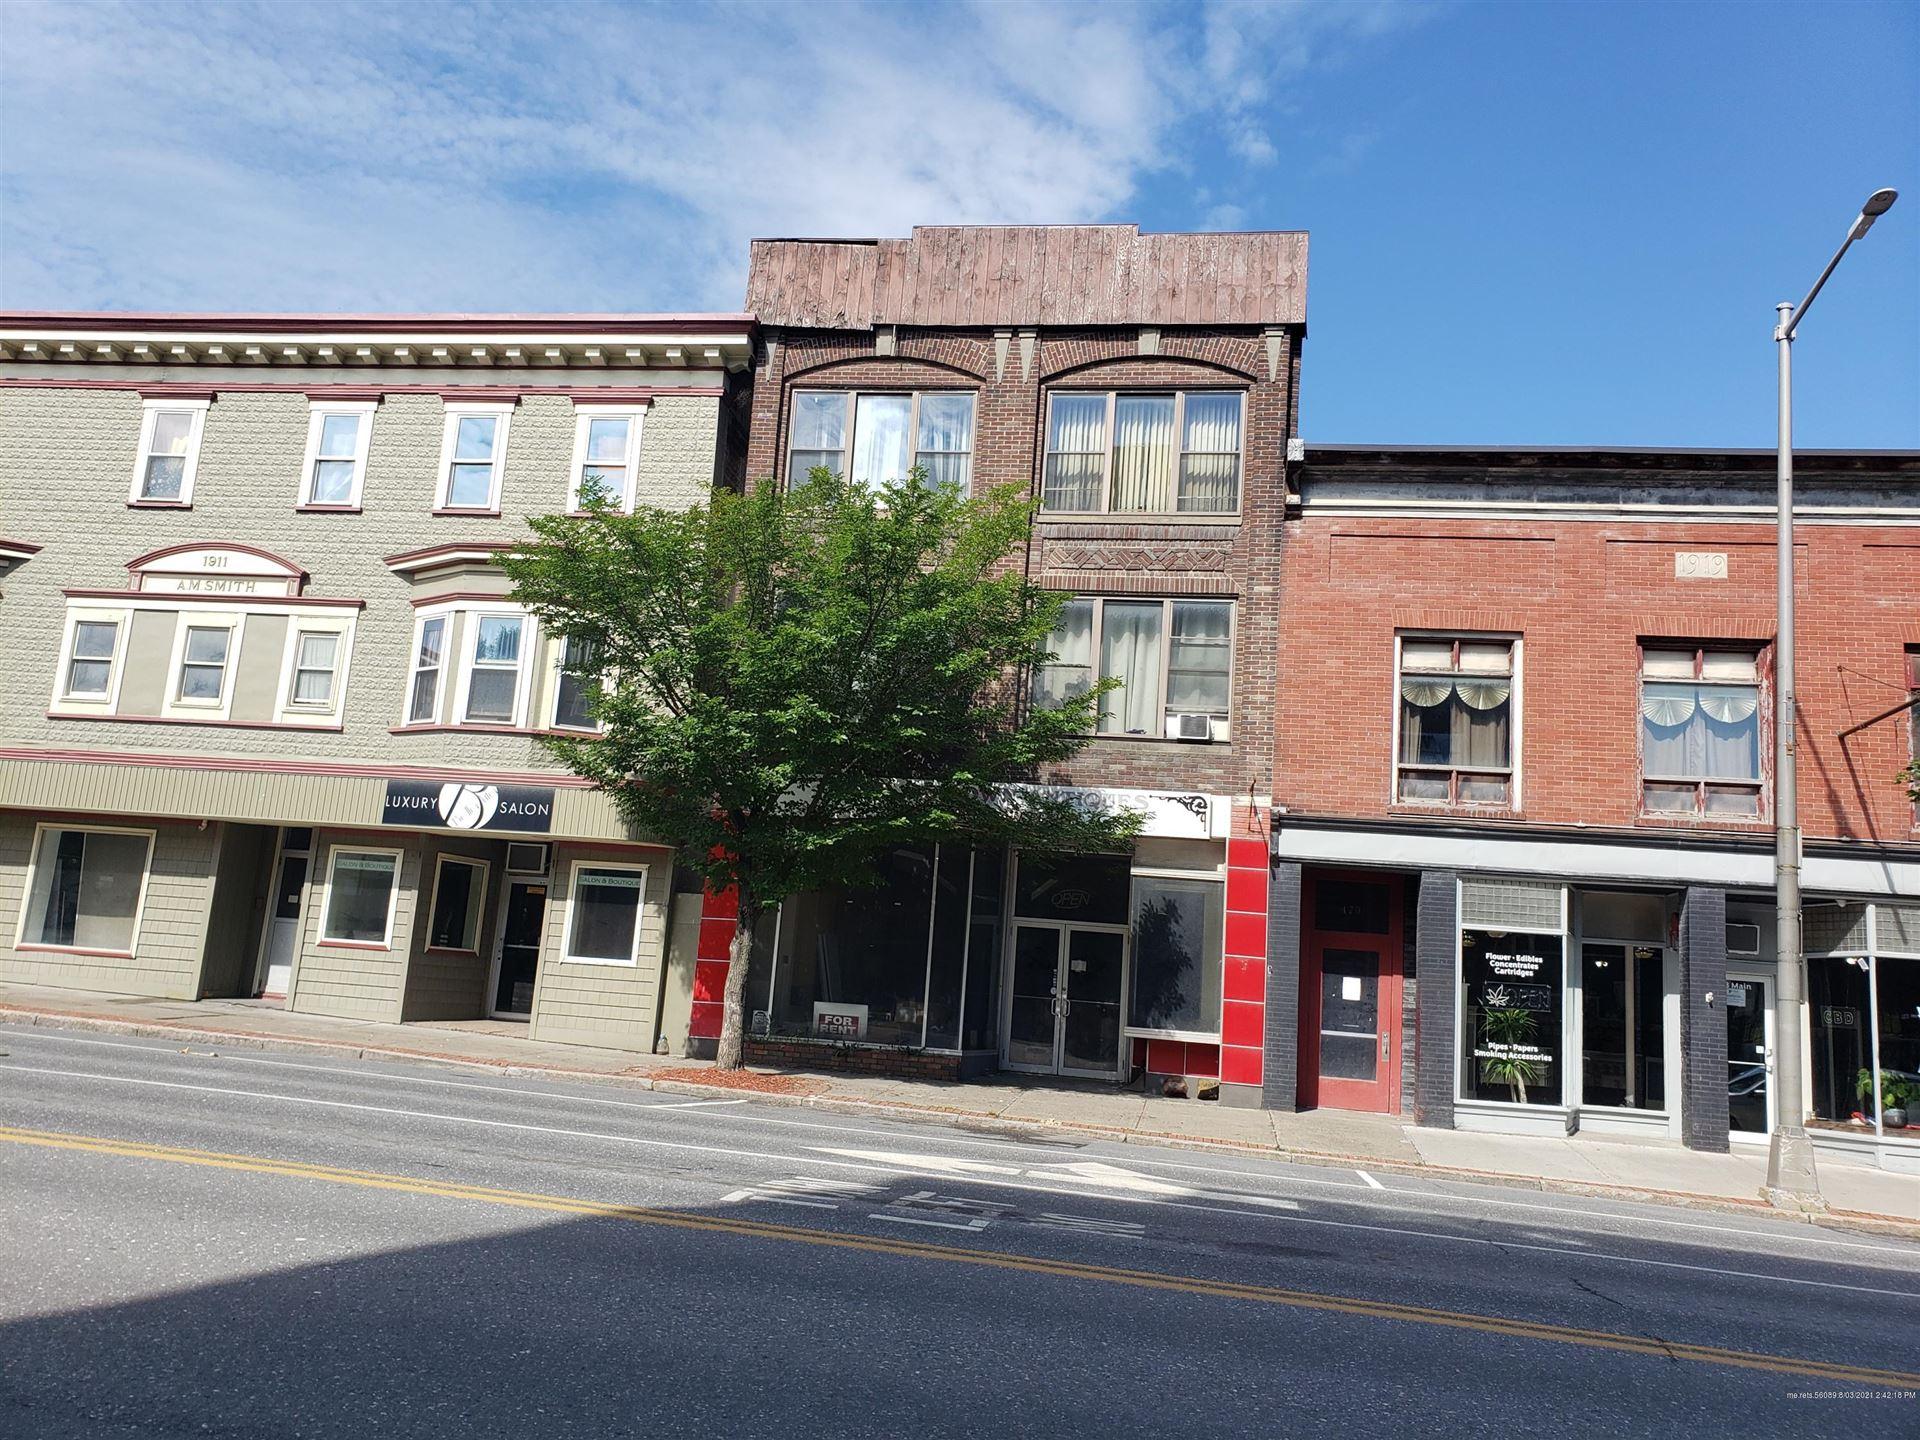 Photo of 477 Main Street, Presque Isle, ME 04769 (MLS # 1503365)